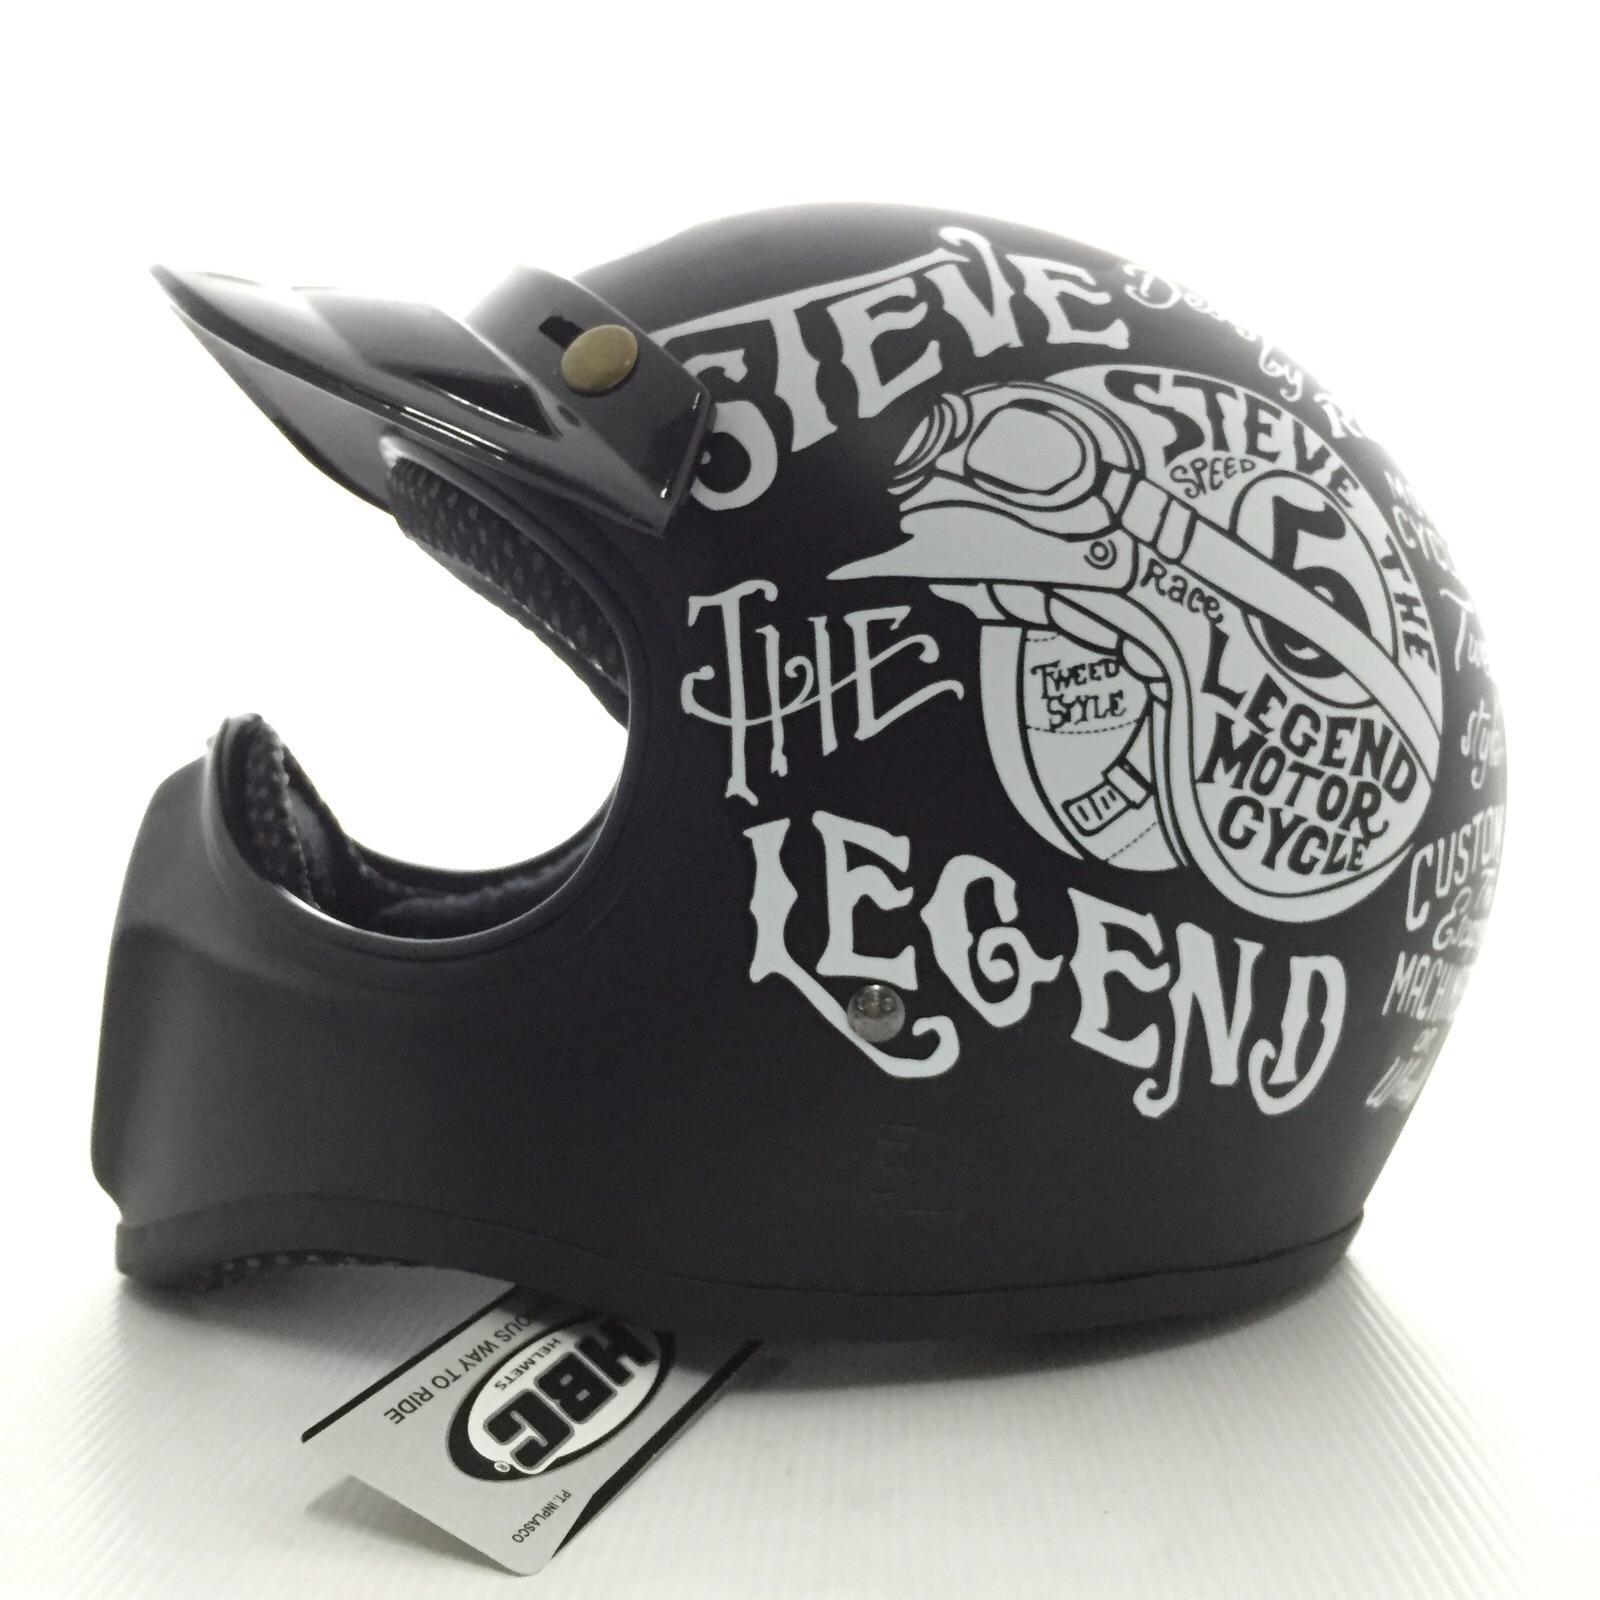 Helm Cakil Hbc Hitam Doff Daftar Harga Terbaru Dan Terlengkap Rust Dust Emas Steve Legend Black